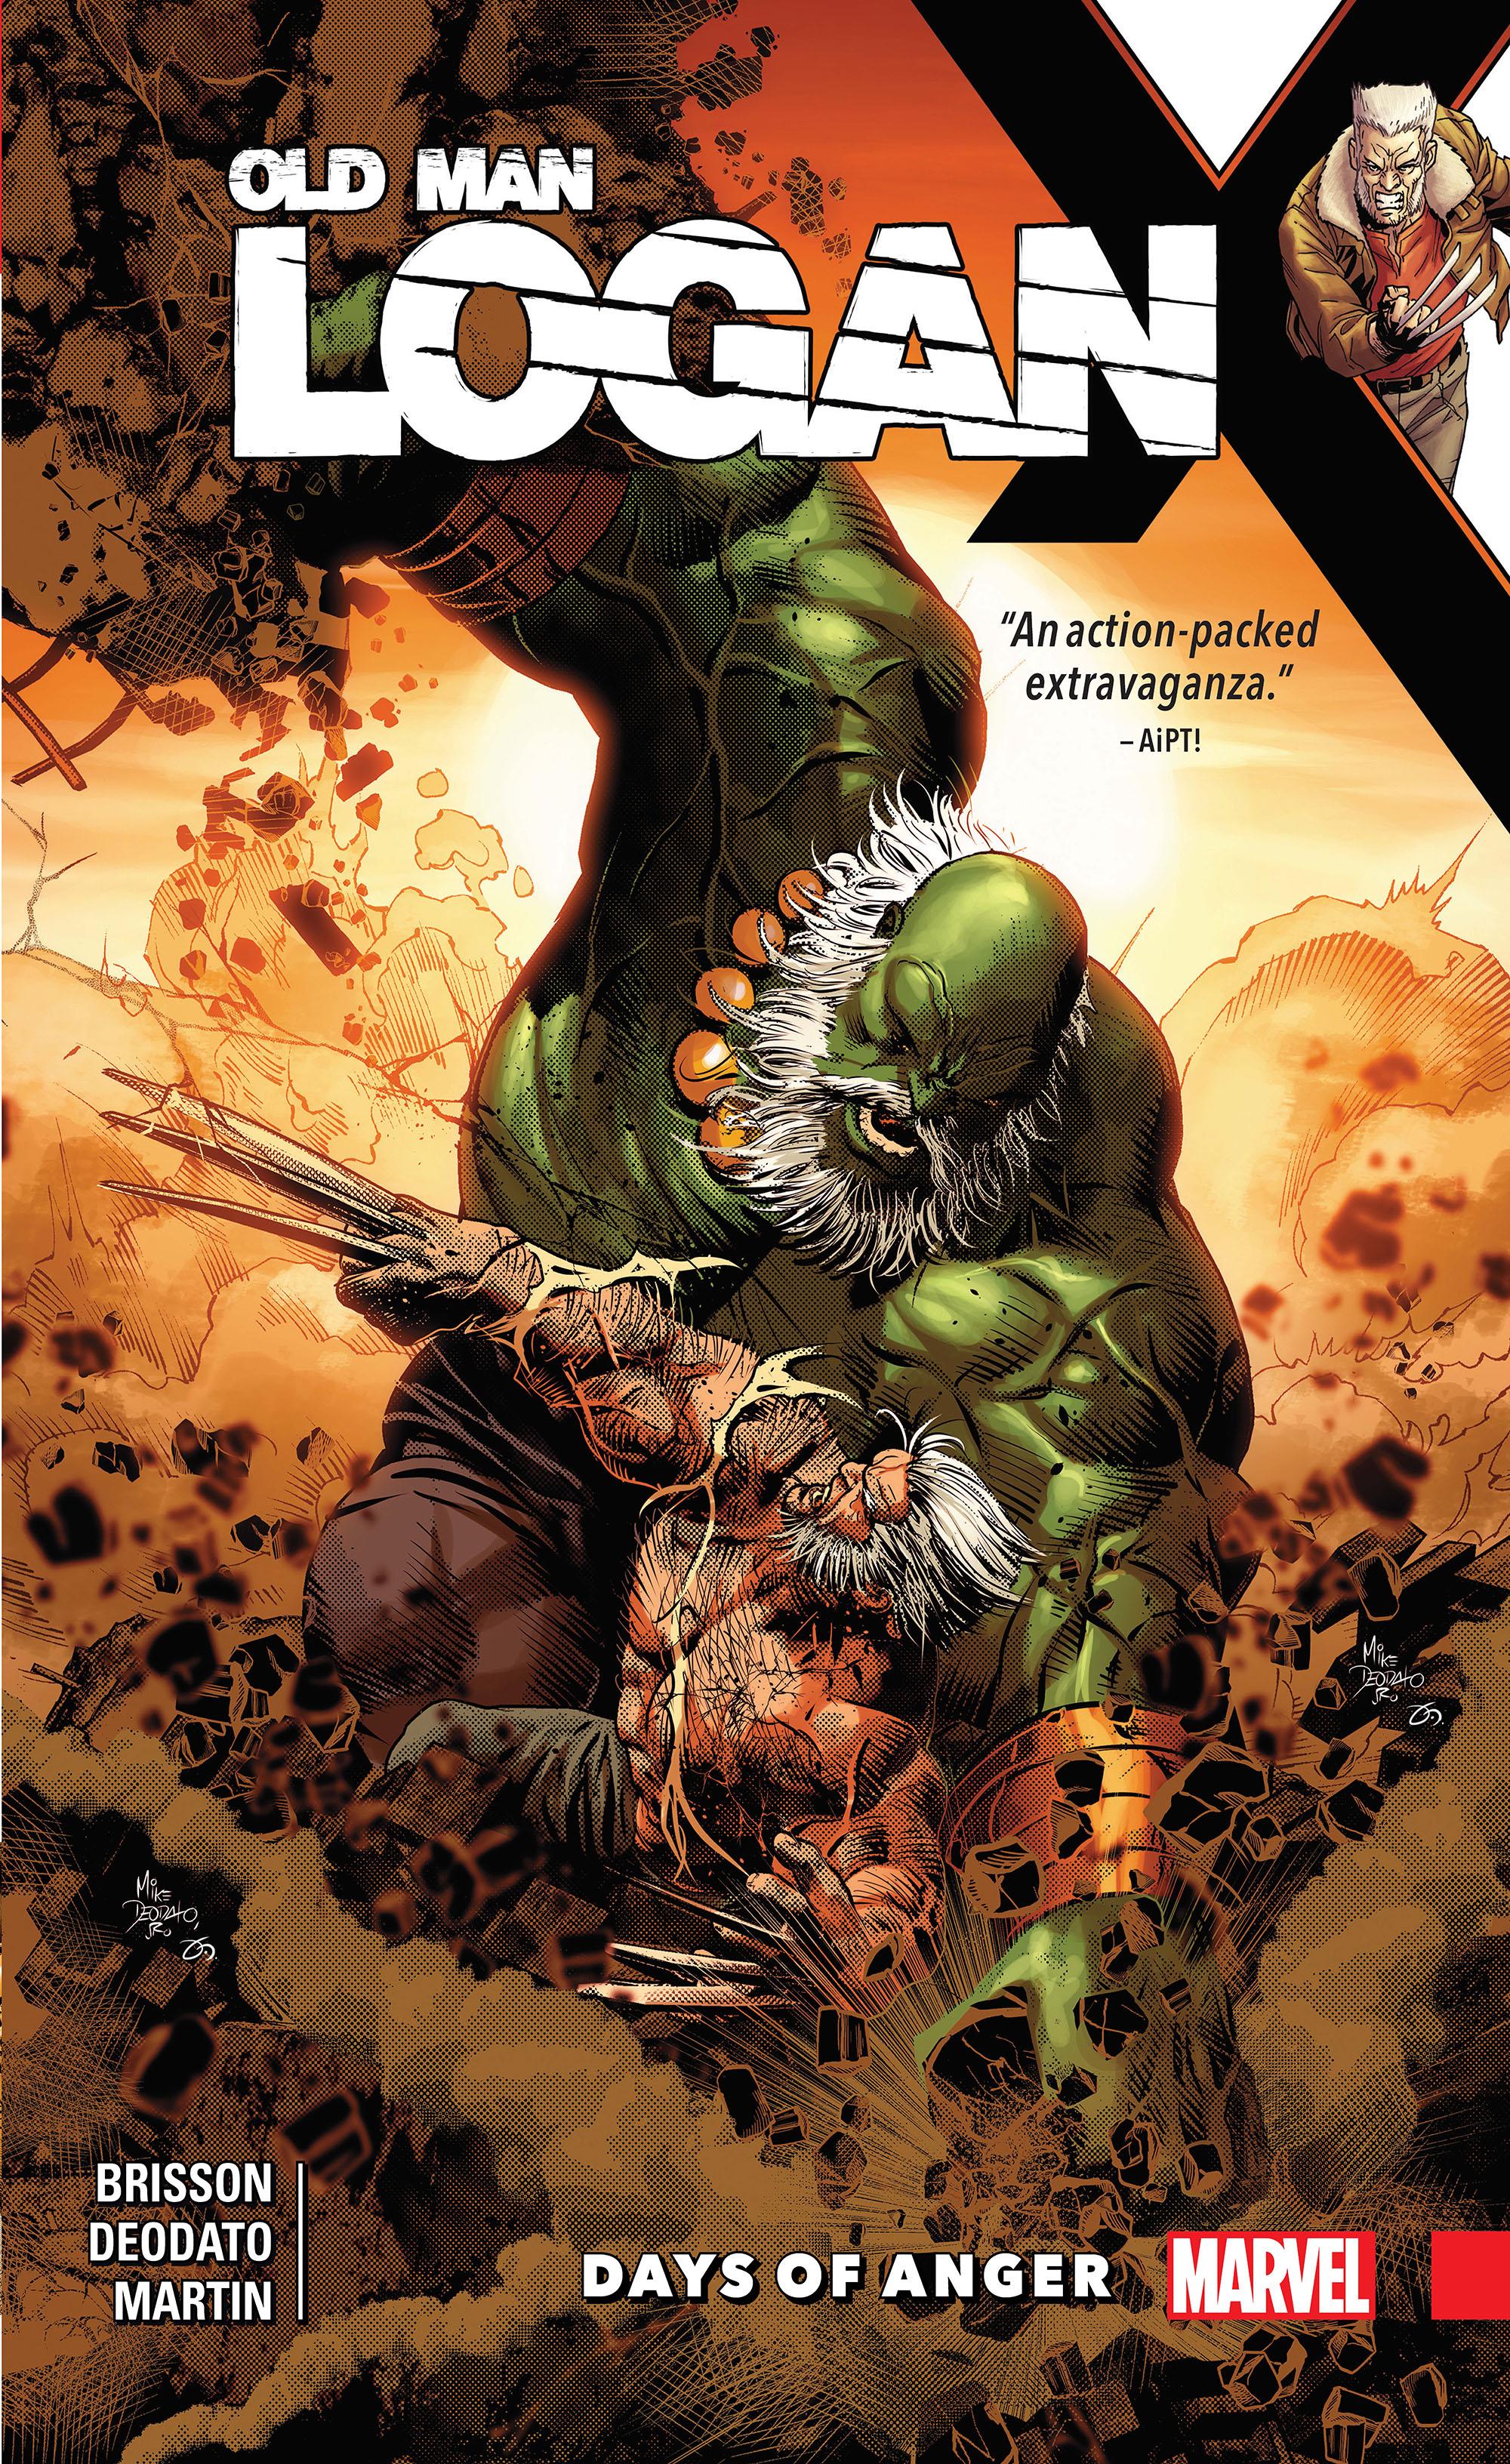 Wolverine: Old Man Logan Vol. 6 - Days of Anger (Trade Paperback)